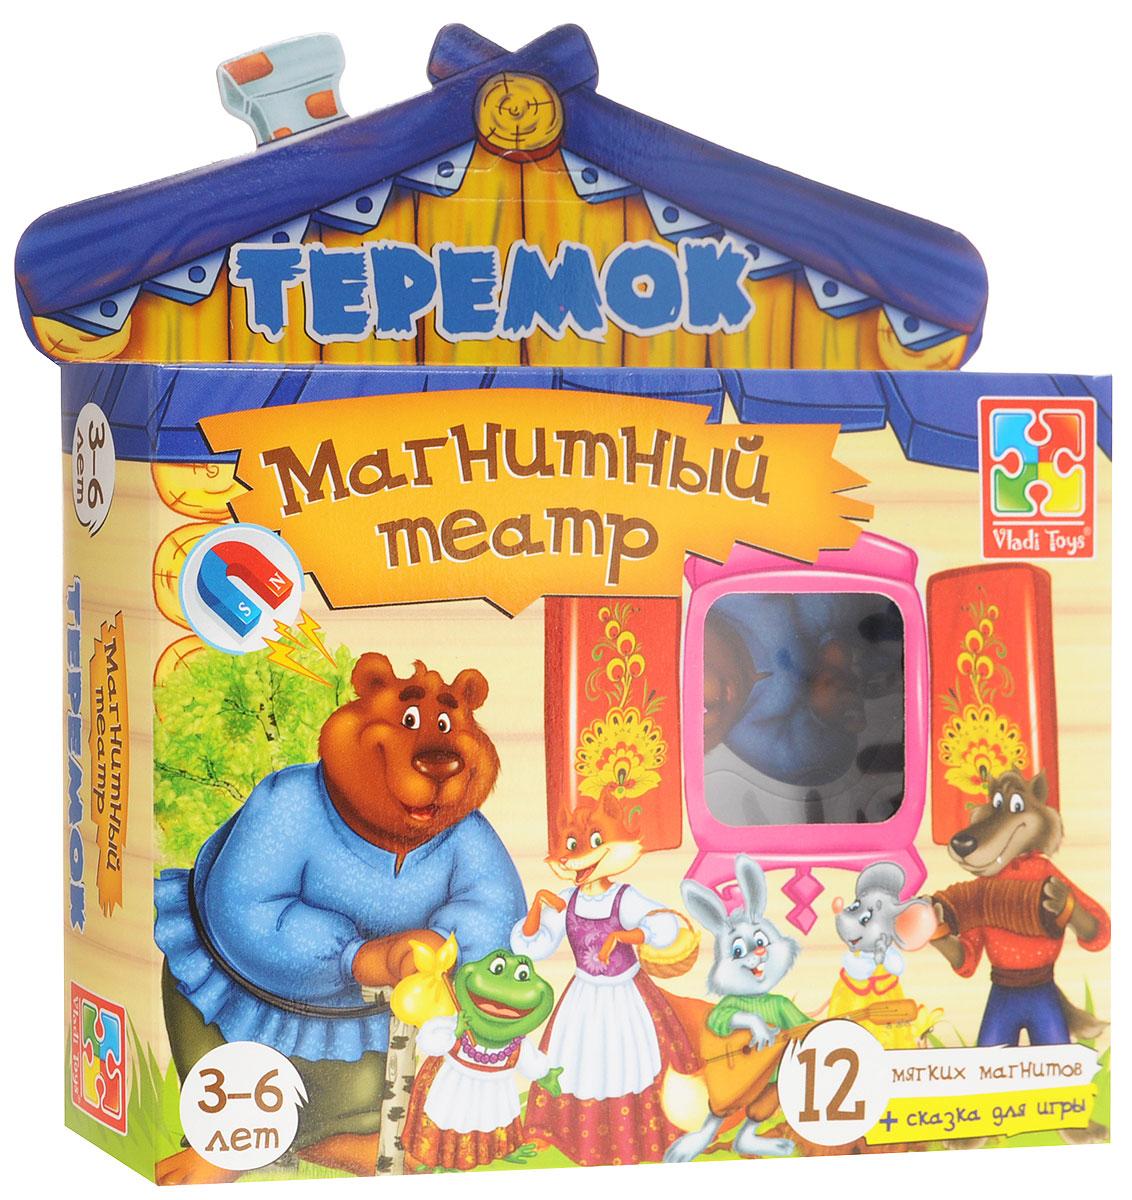 Vladi Toys Магнитный театр Теремок vladi toys магнитный кукольный театр репка